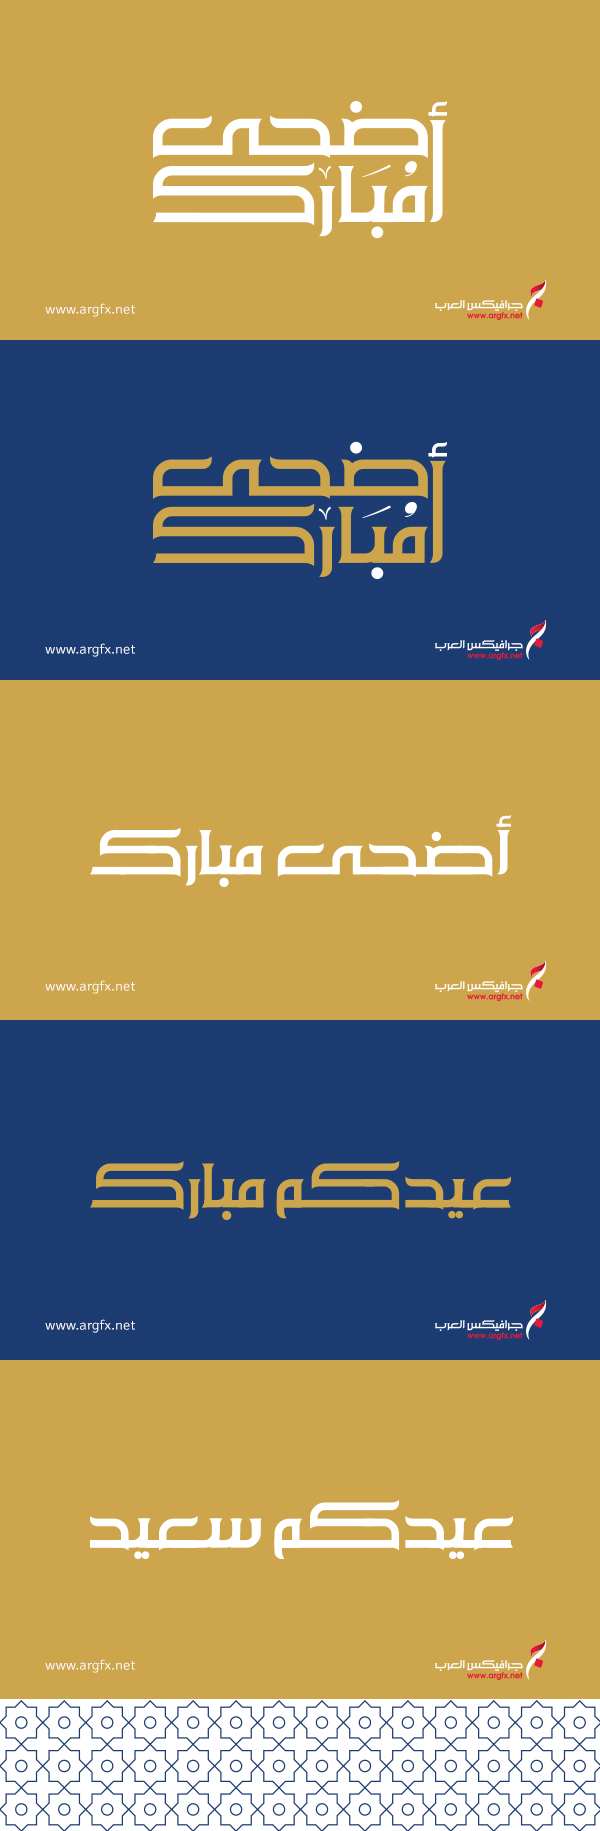 Eid Mubarak Arabic Typography Free Download On Behance